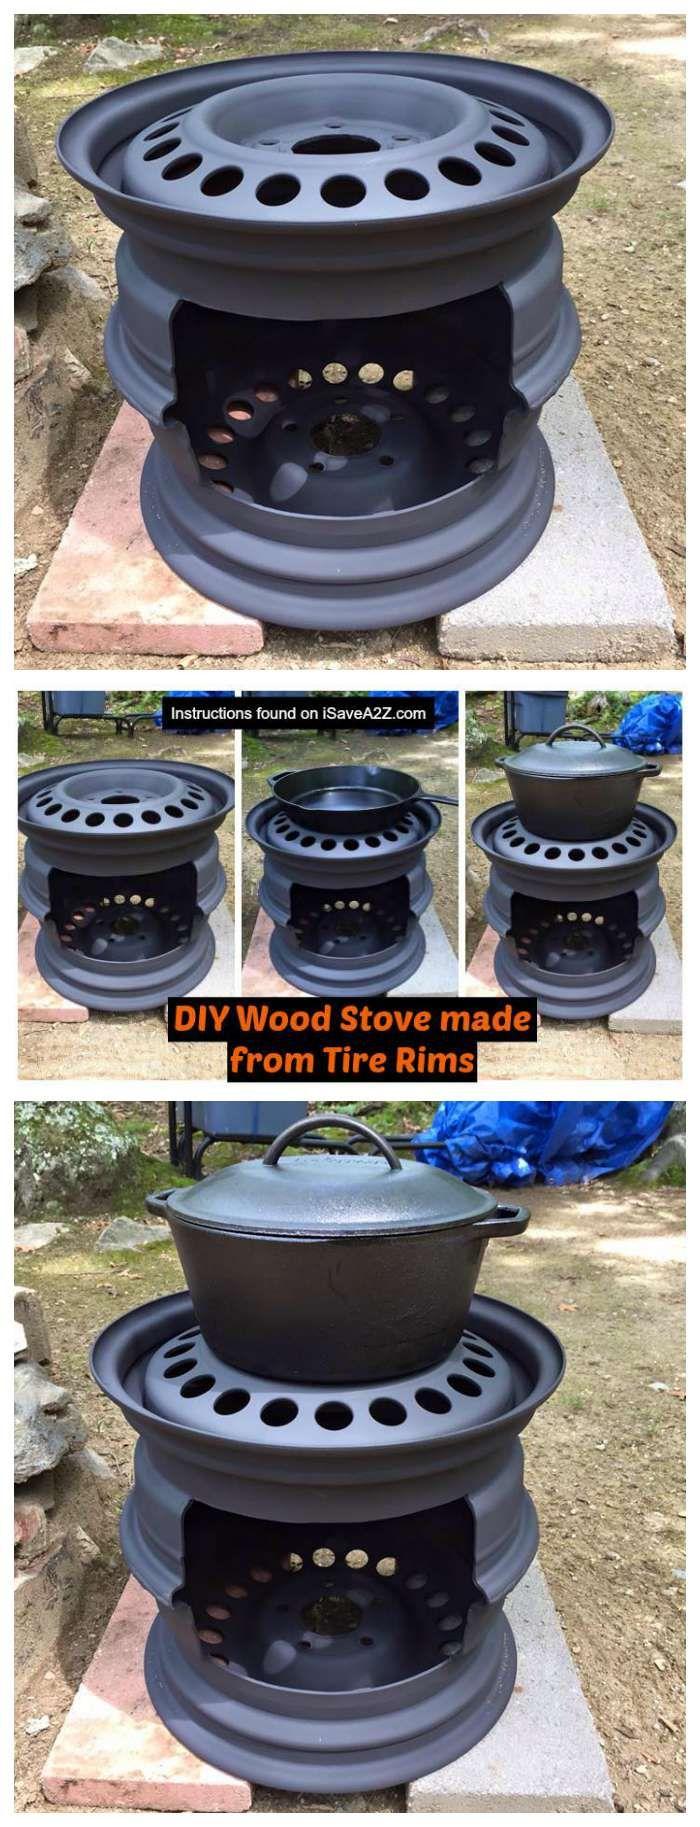 Diy Wood Stove Made From Tire Rims Projecteurs En Plein Air